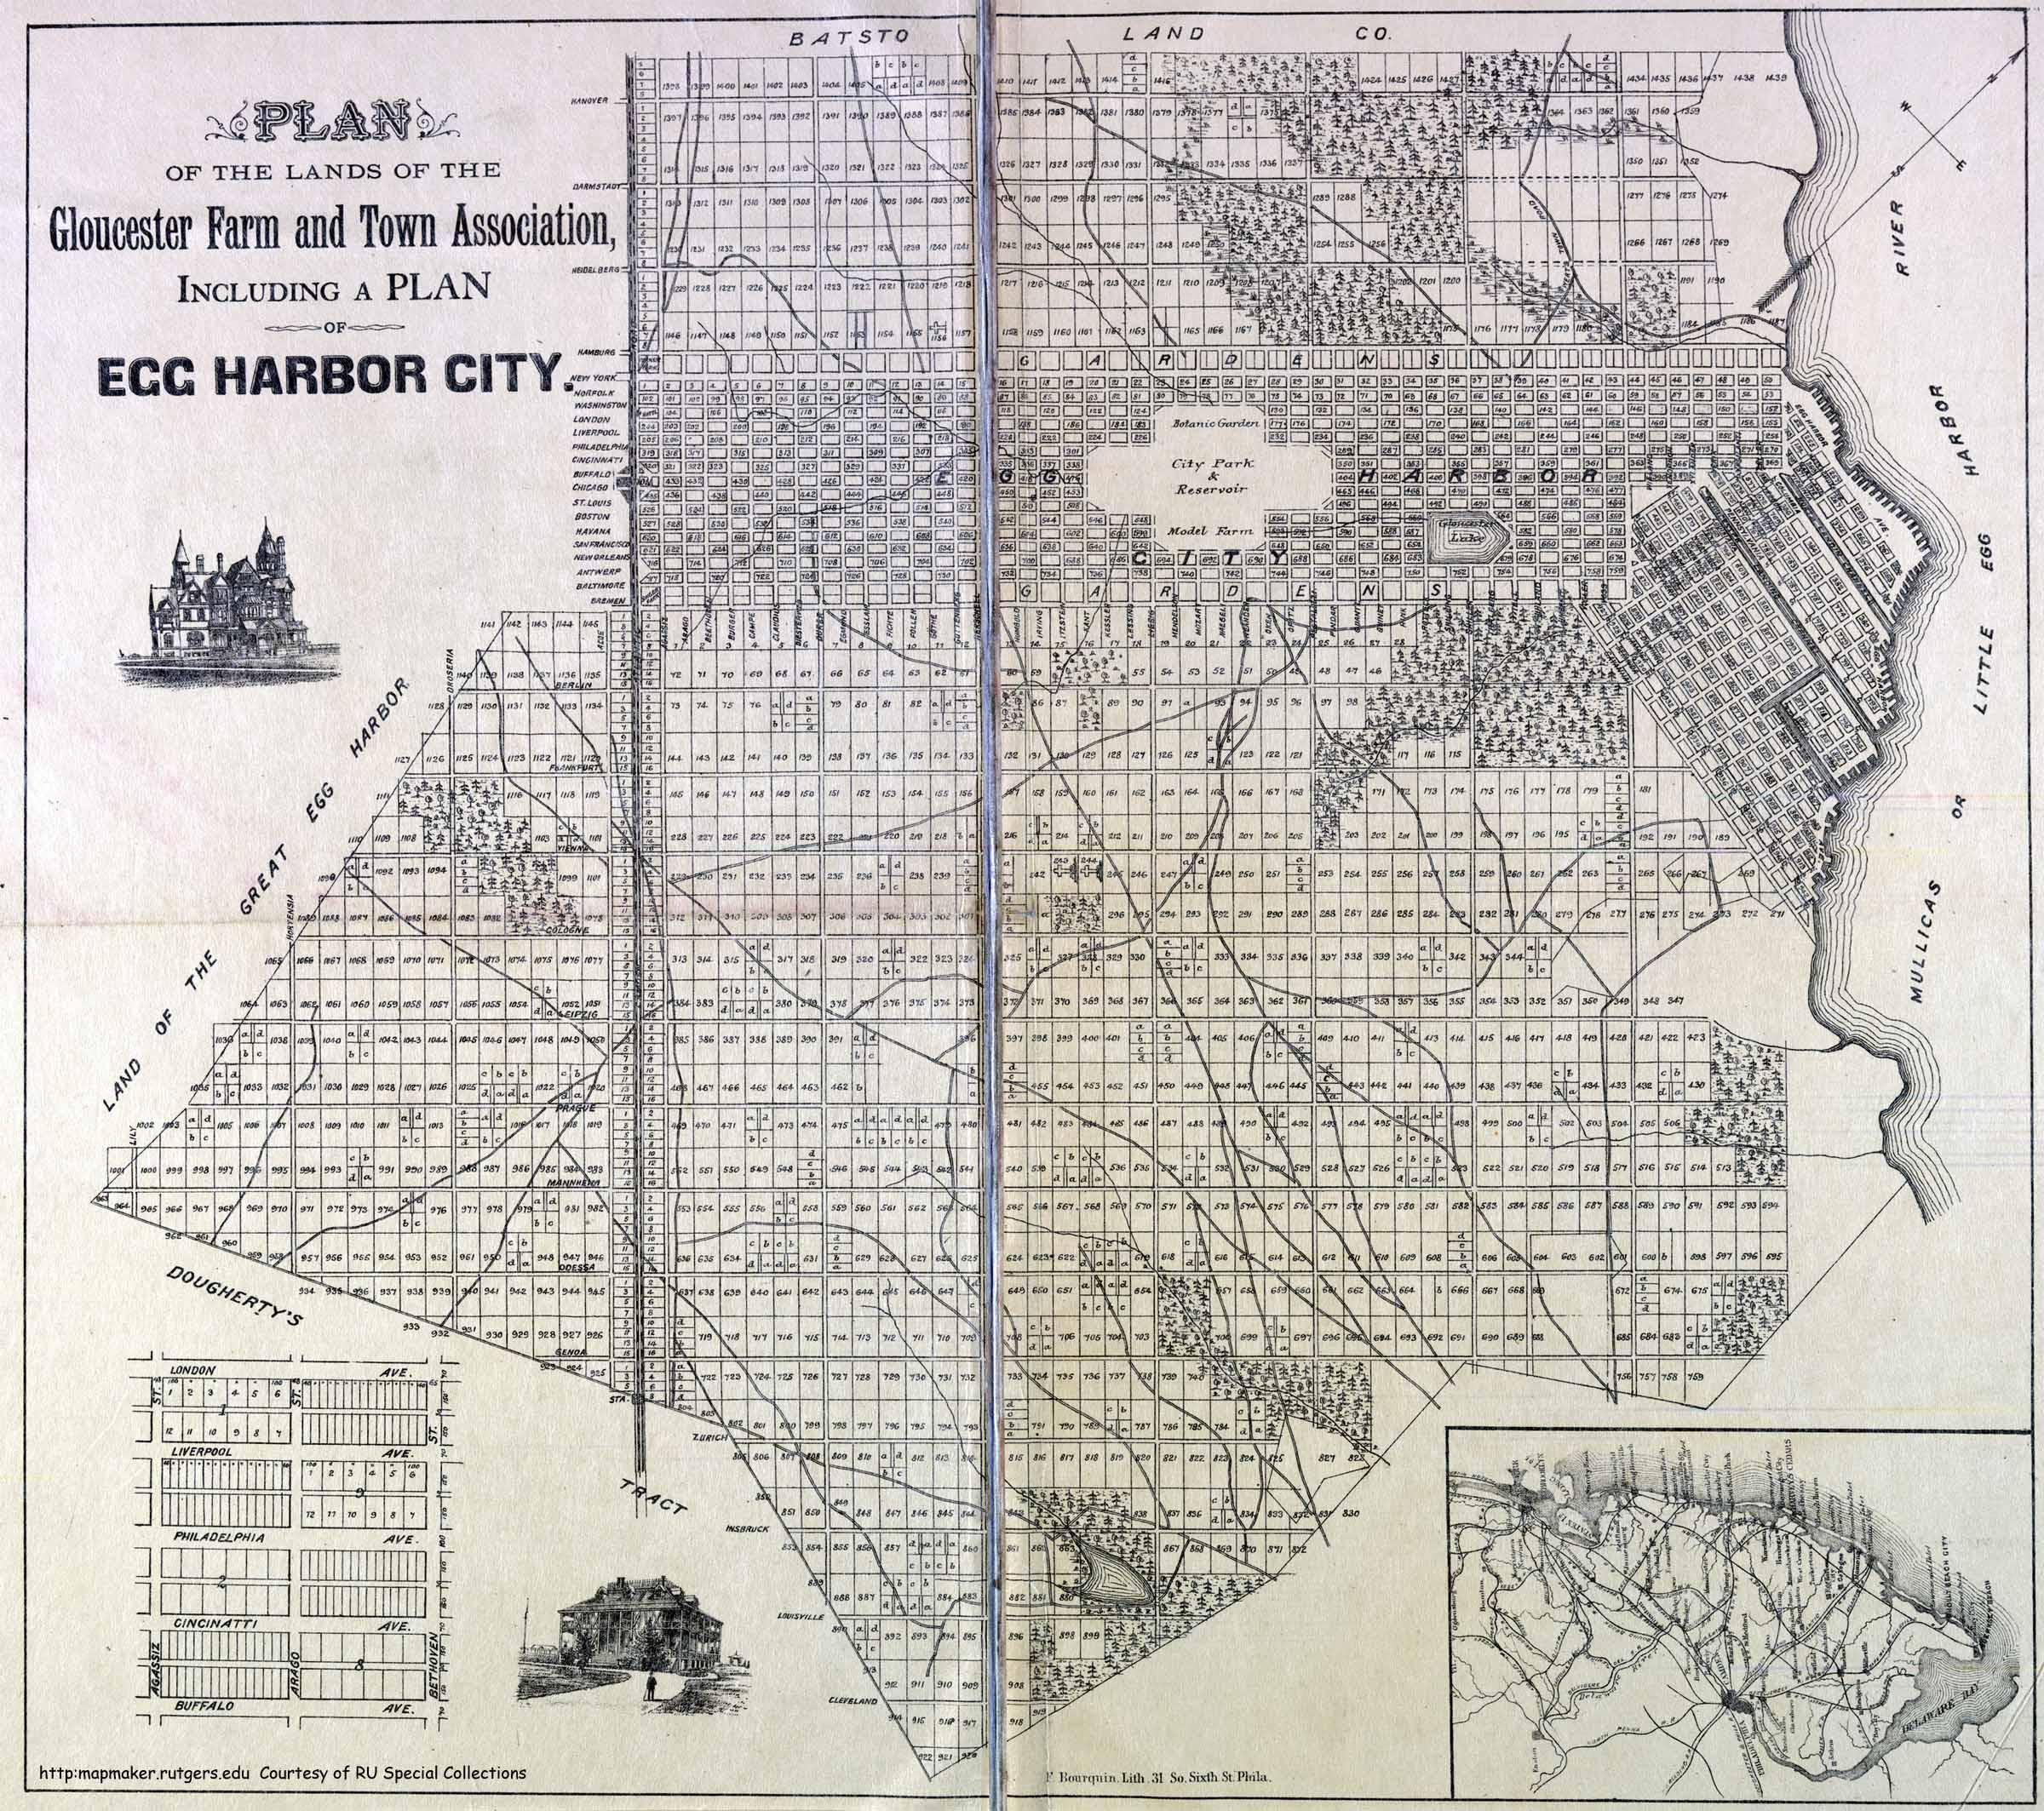 Historical Atlantic County, New Jersey Mapsegg harbor city city